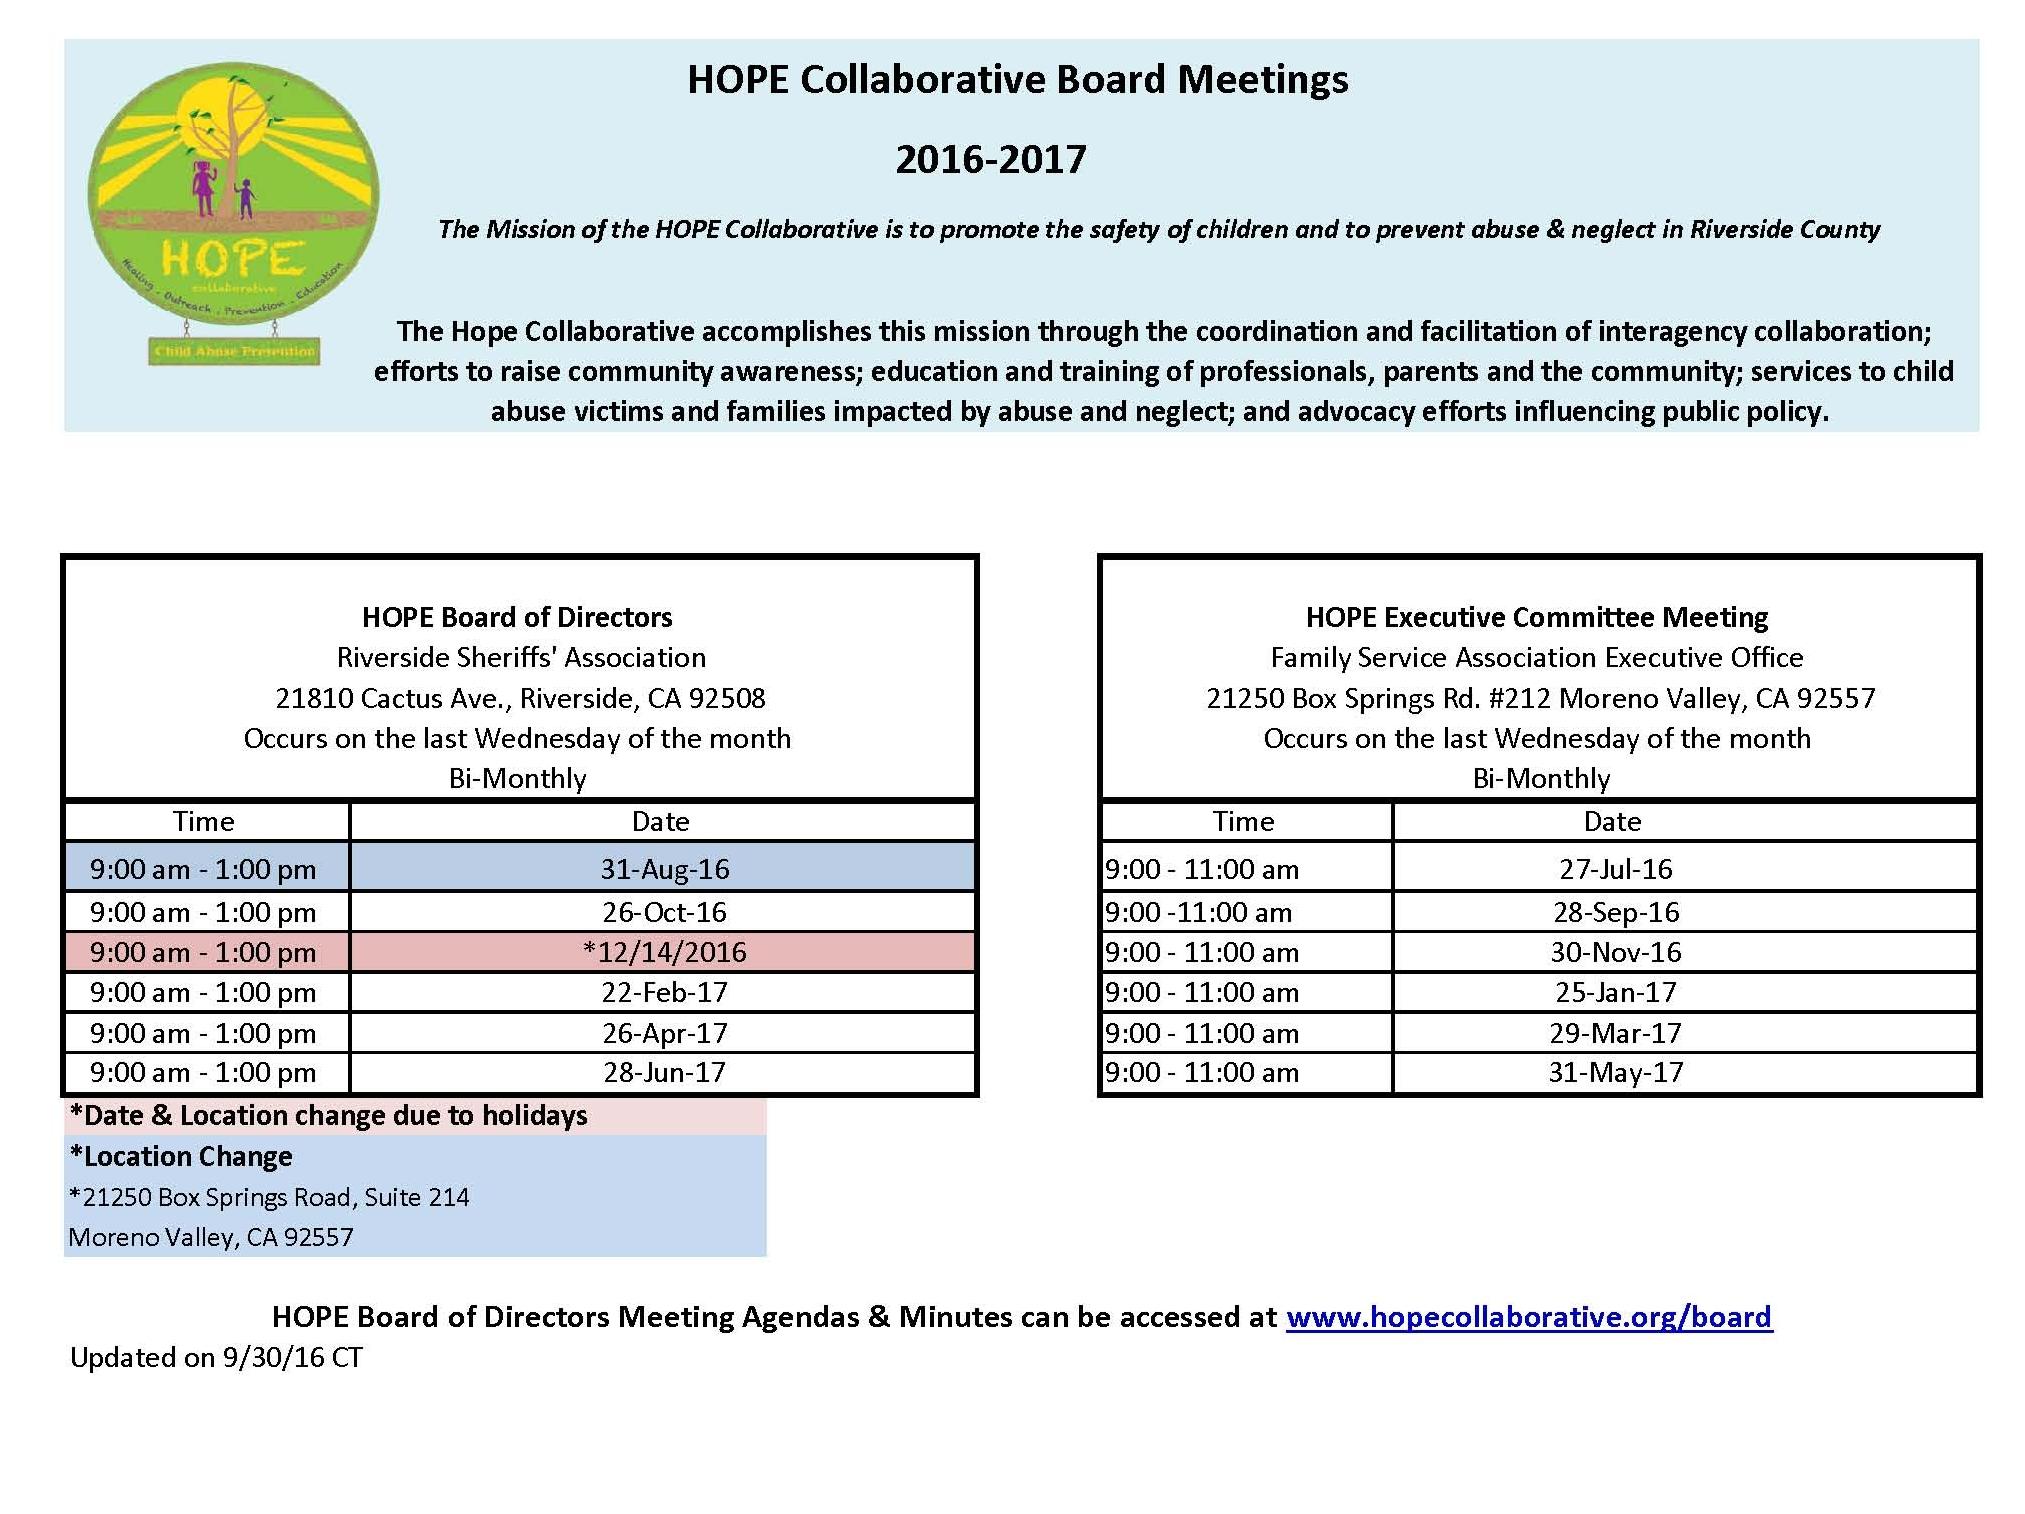 NEW HOPE Regional Collab Calendar FY16-17.jpg